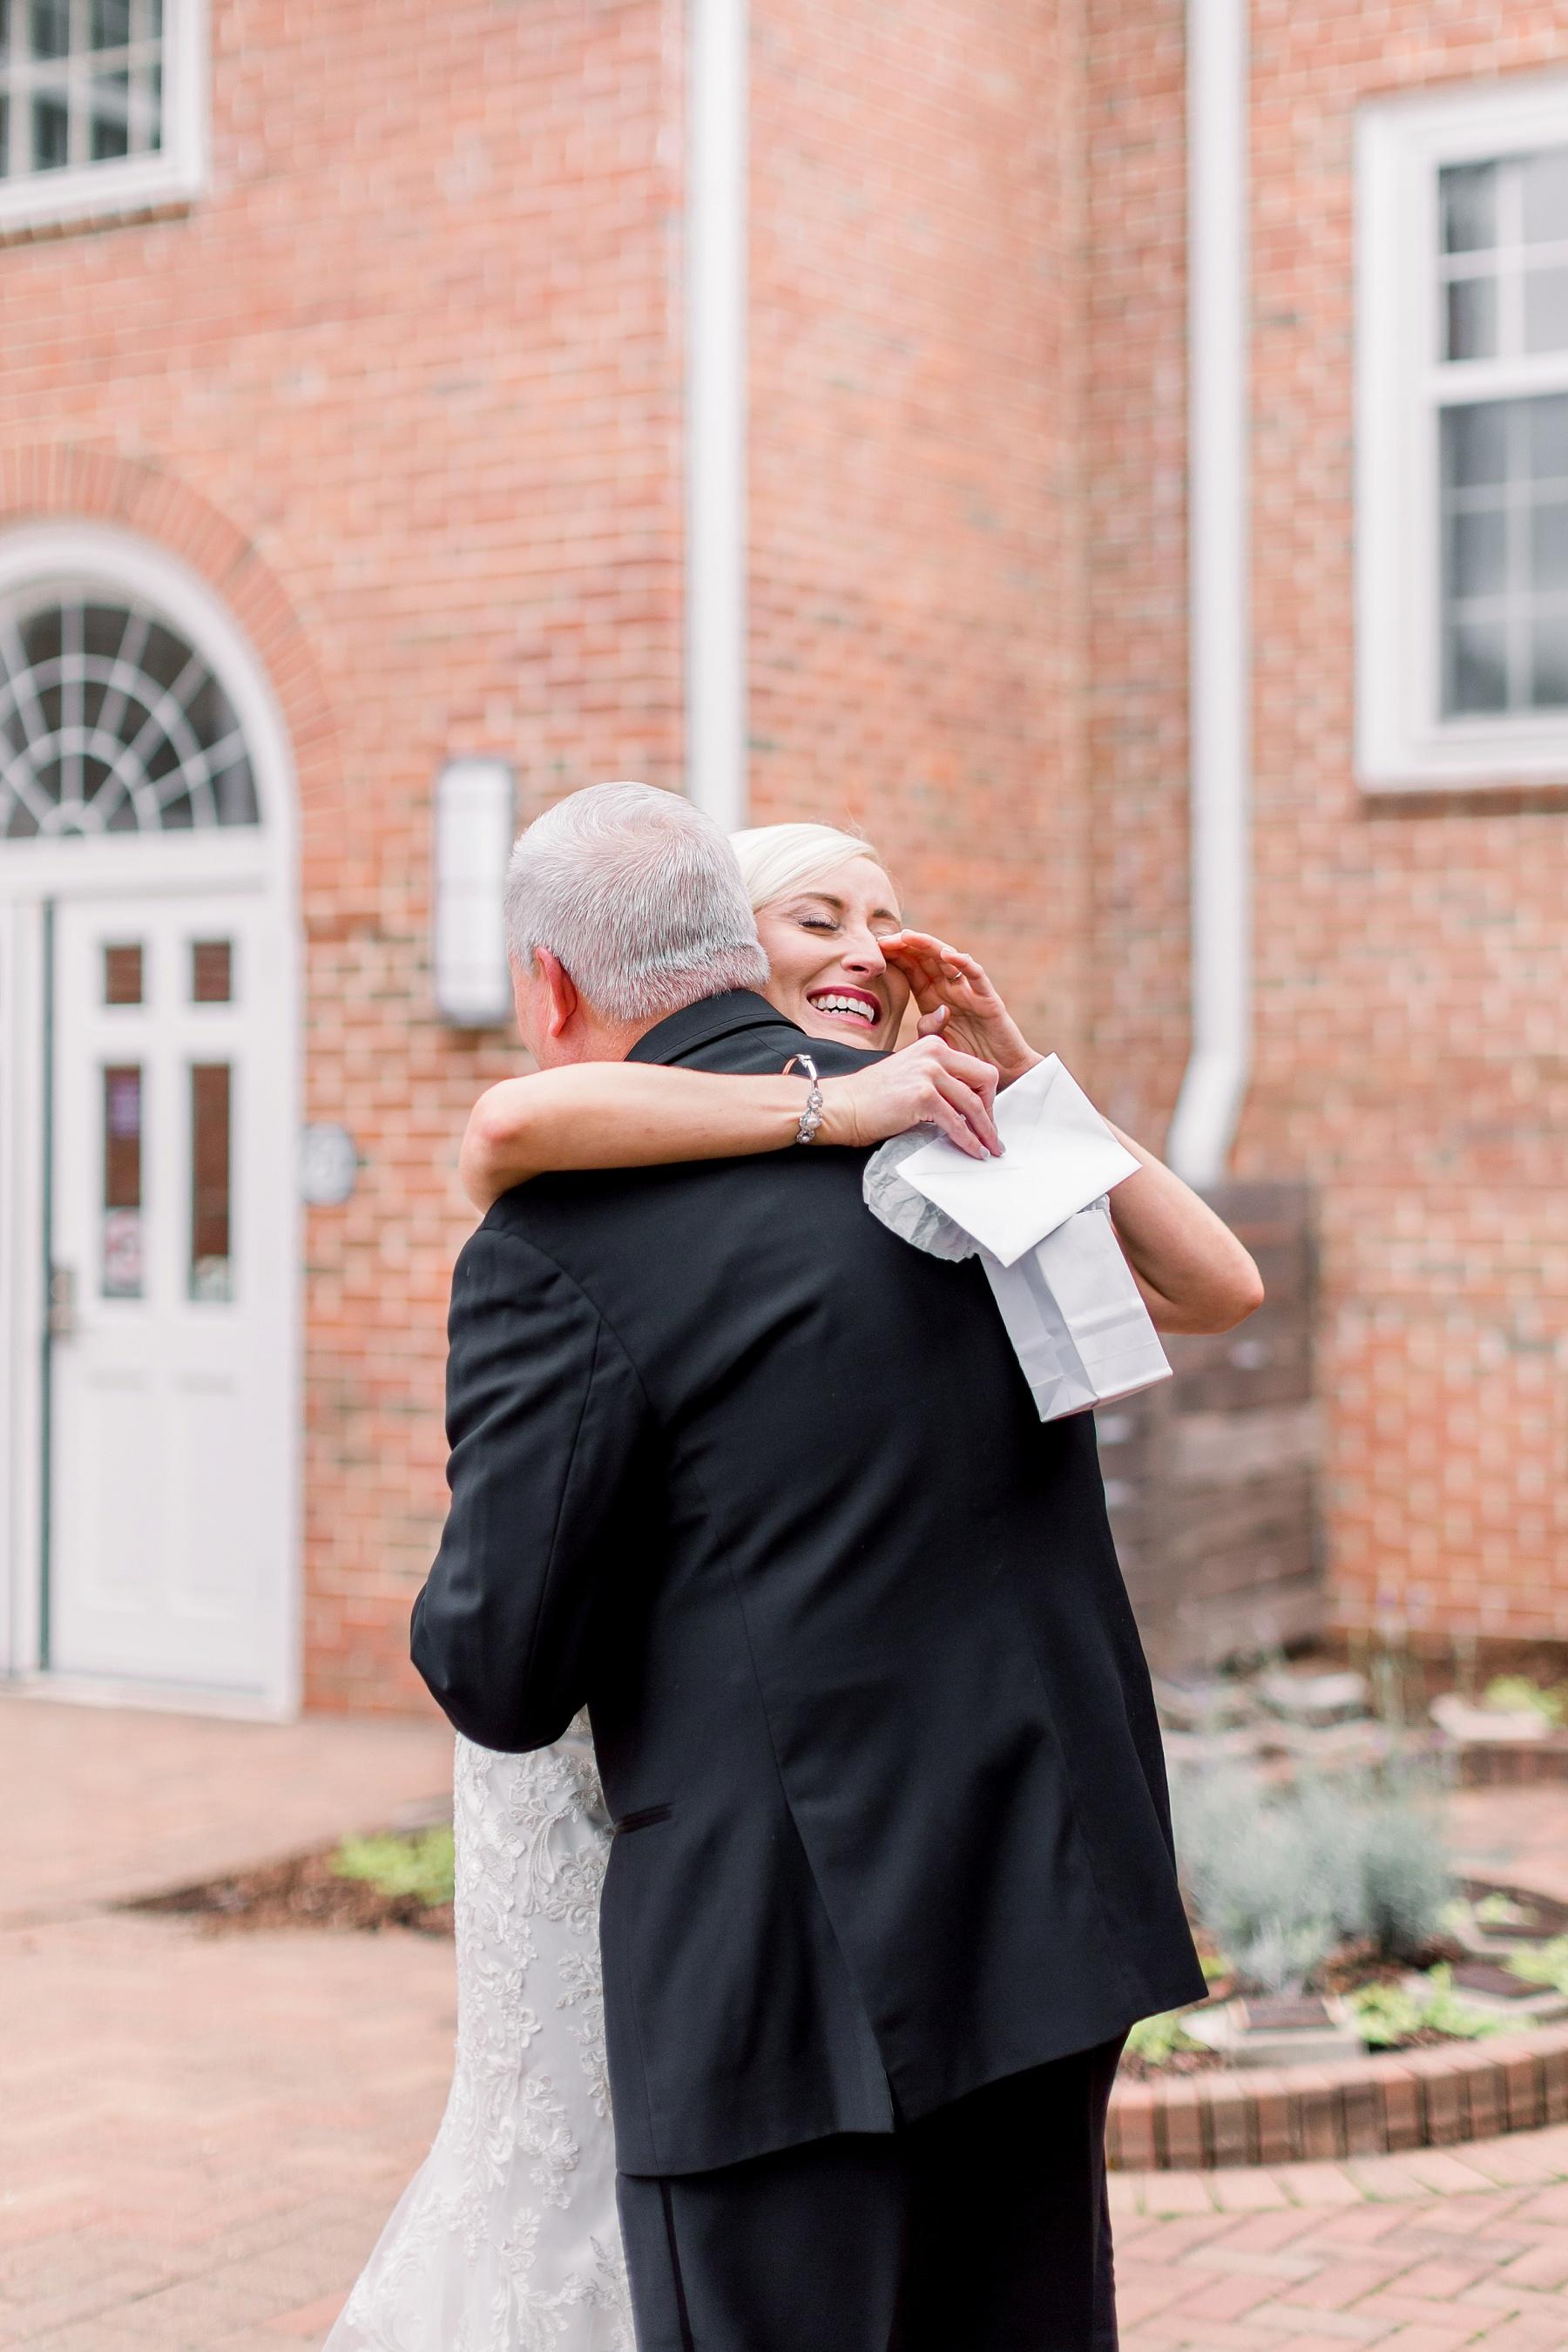 midwest-adventurous-wedding-photographer-elizabeth-ladean-photography-photo_4711.jpg